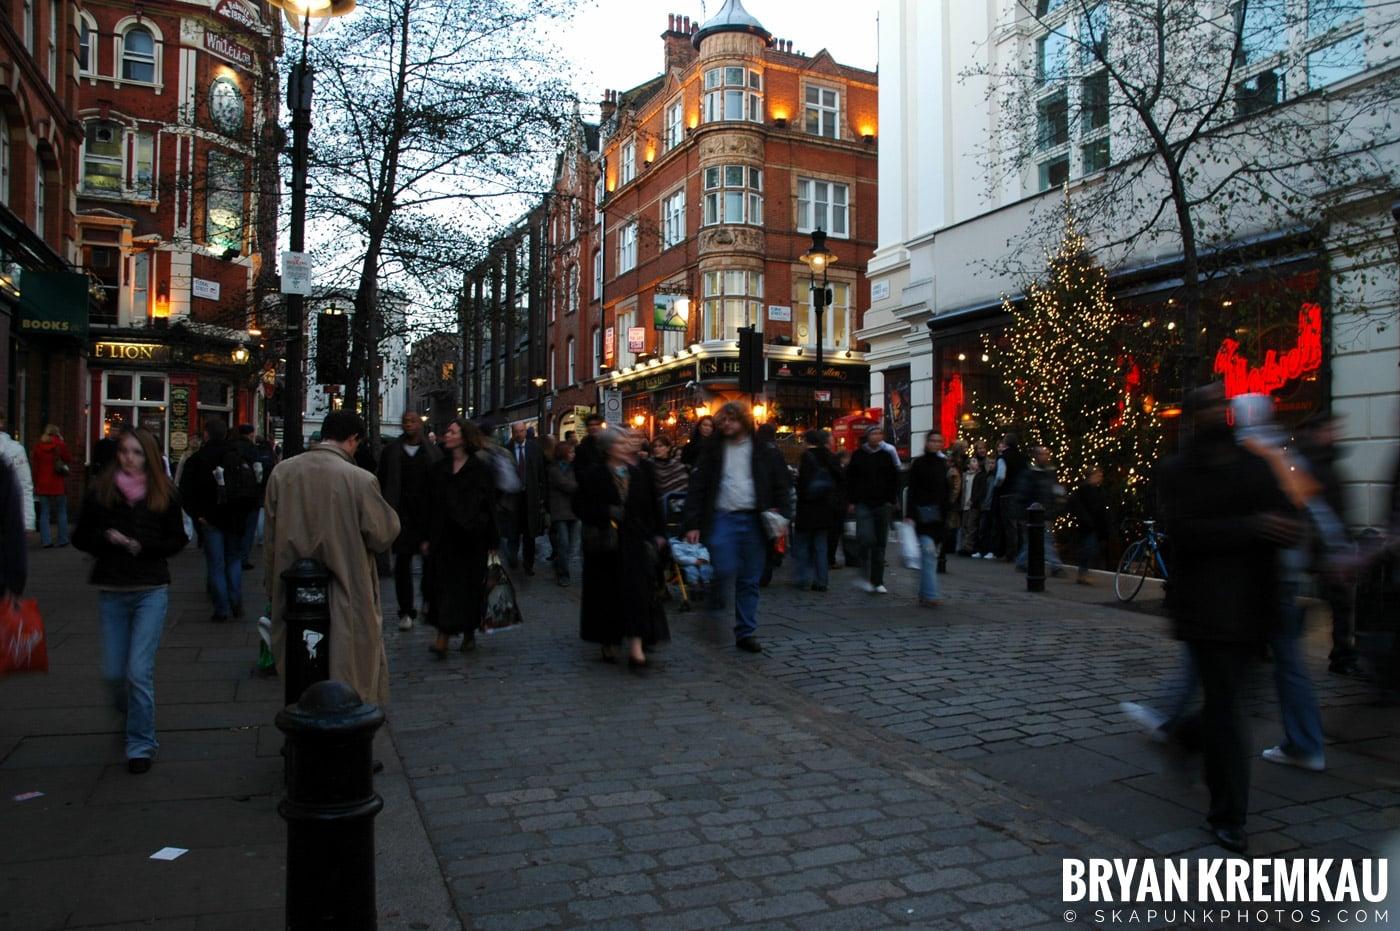 London, England - Day 4 - 12.19.05 (5)